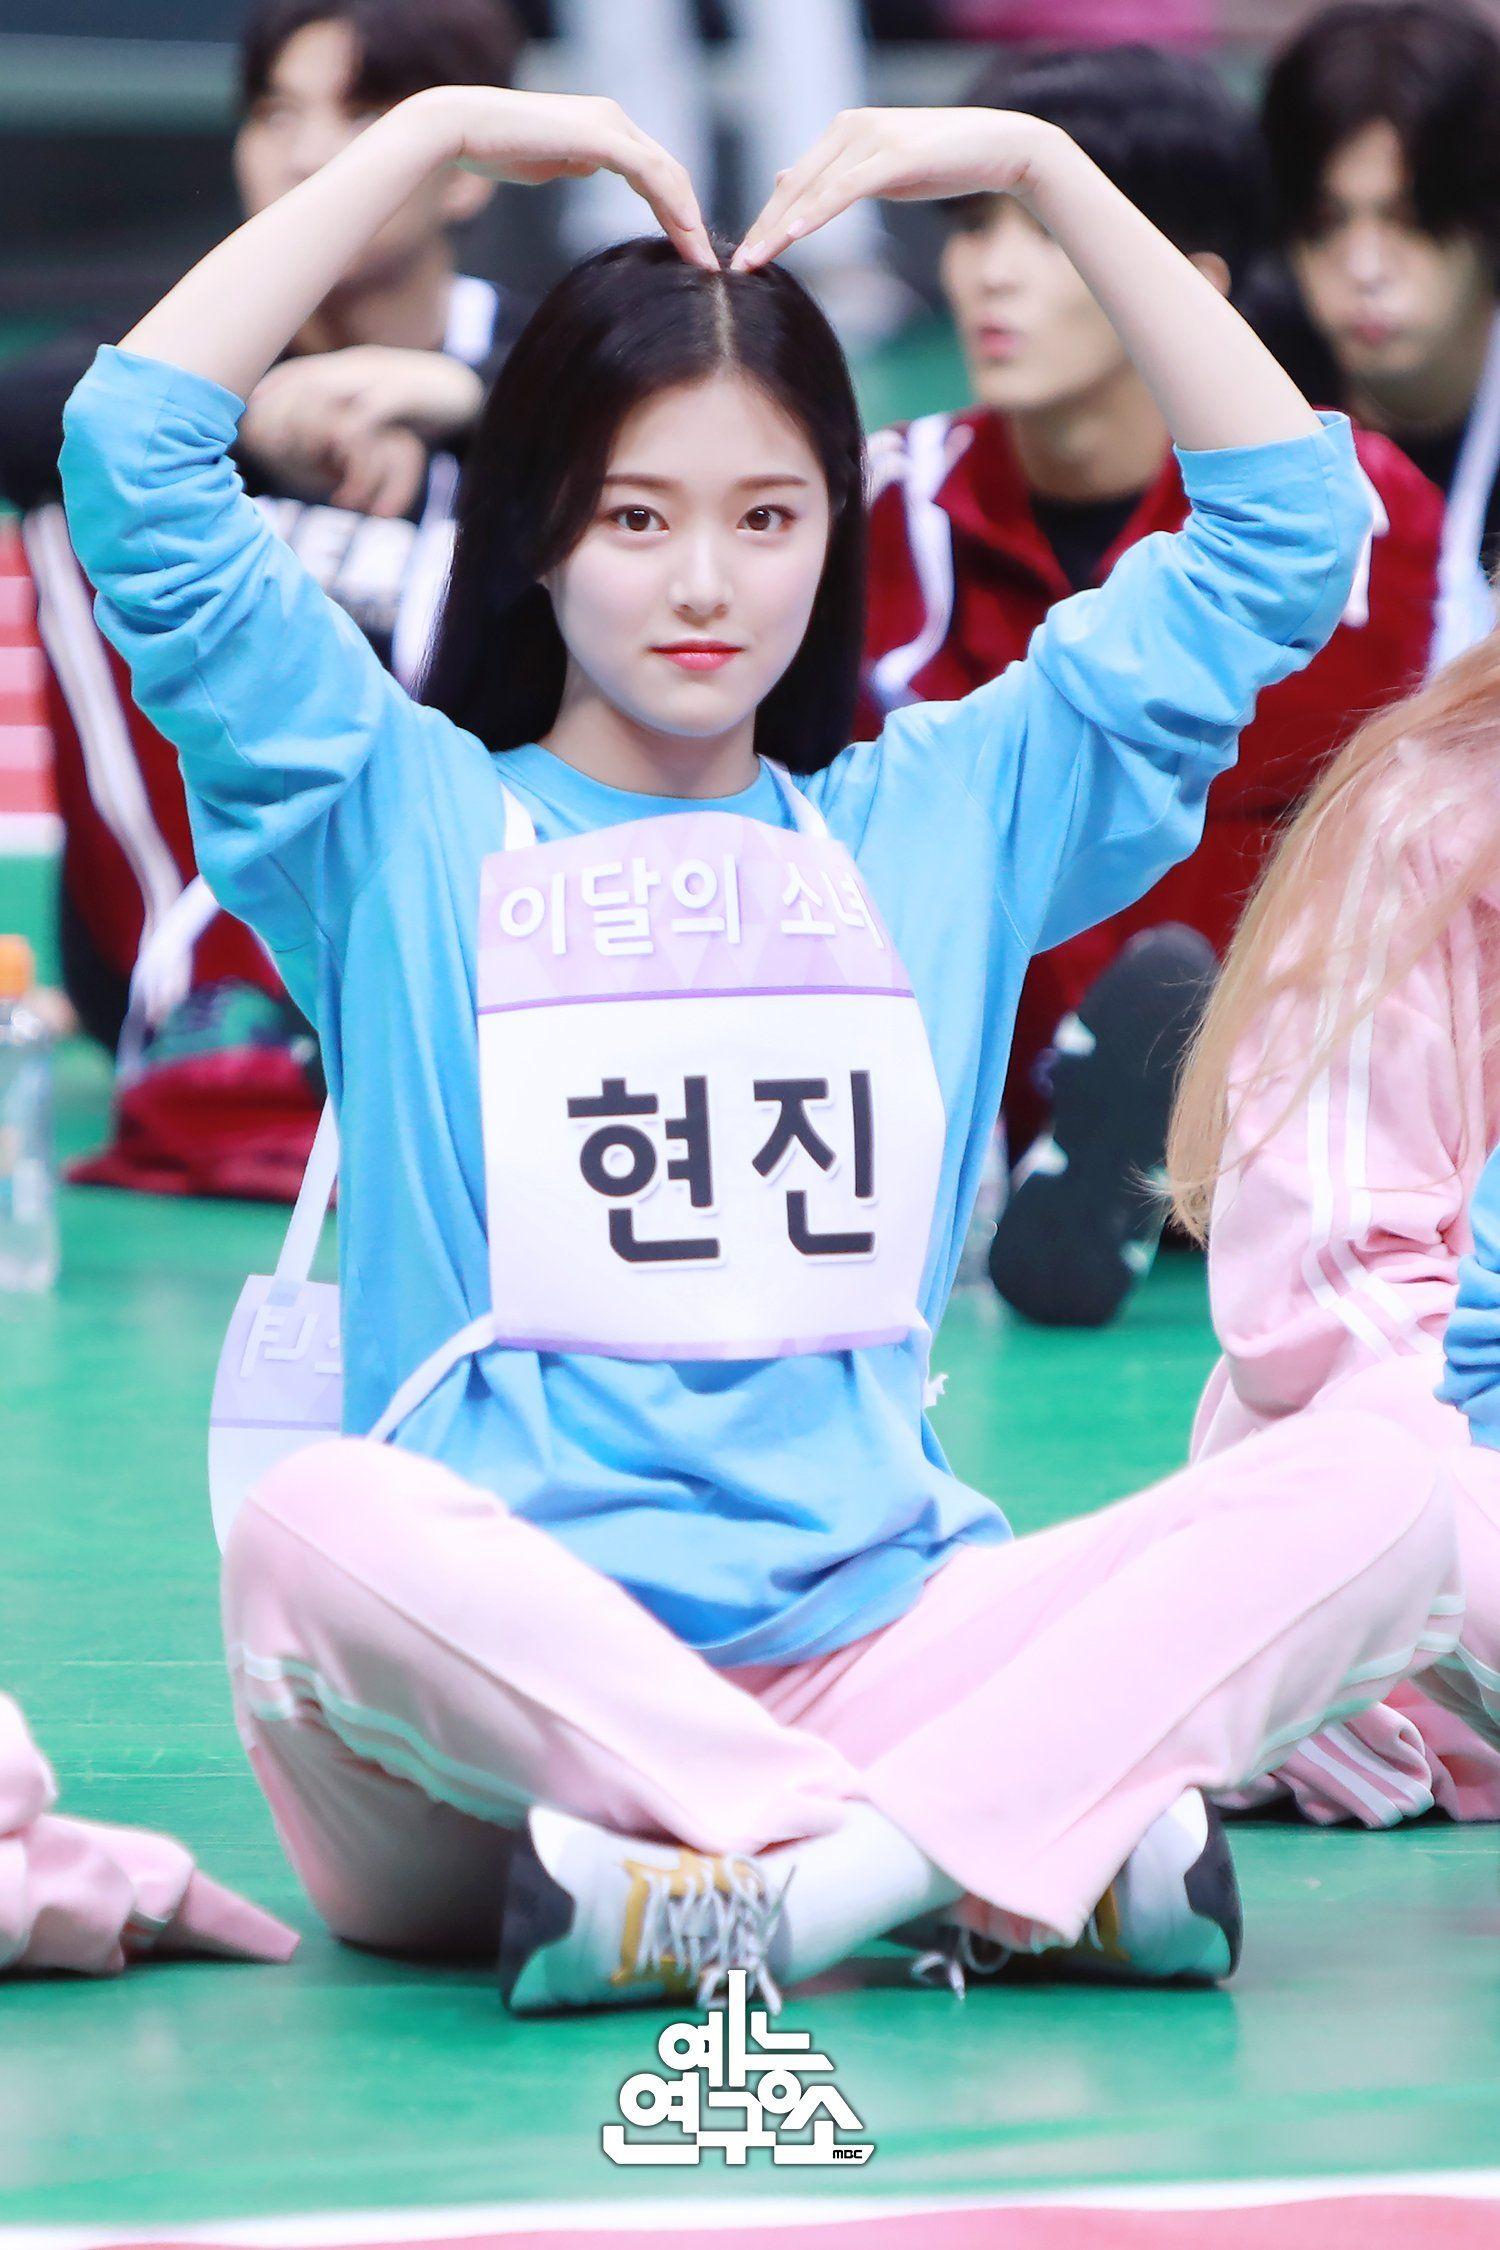 Hyunjin kpop kdrama bts exo kpoparmy